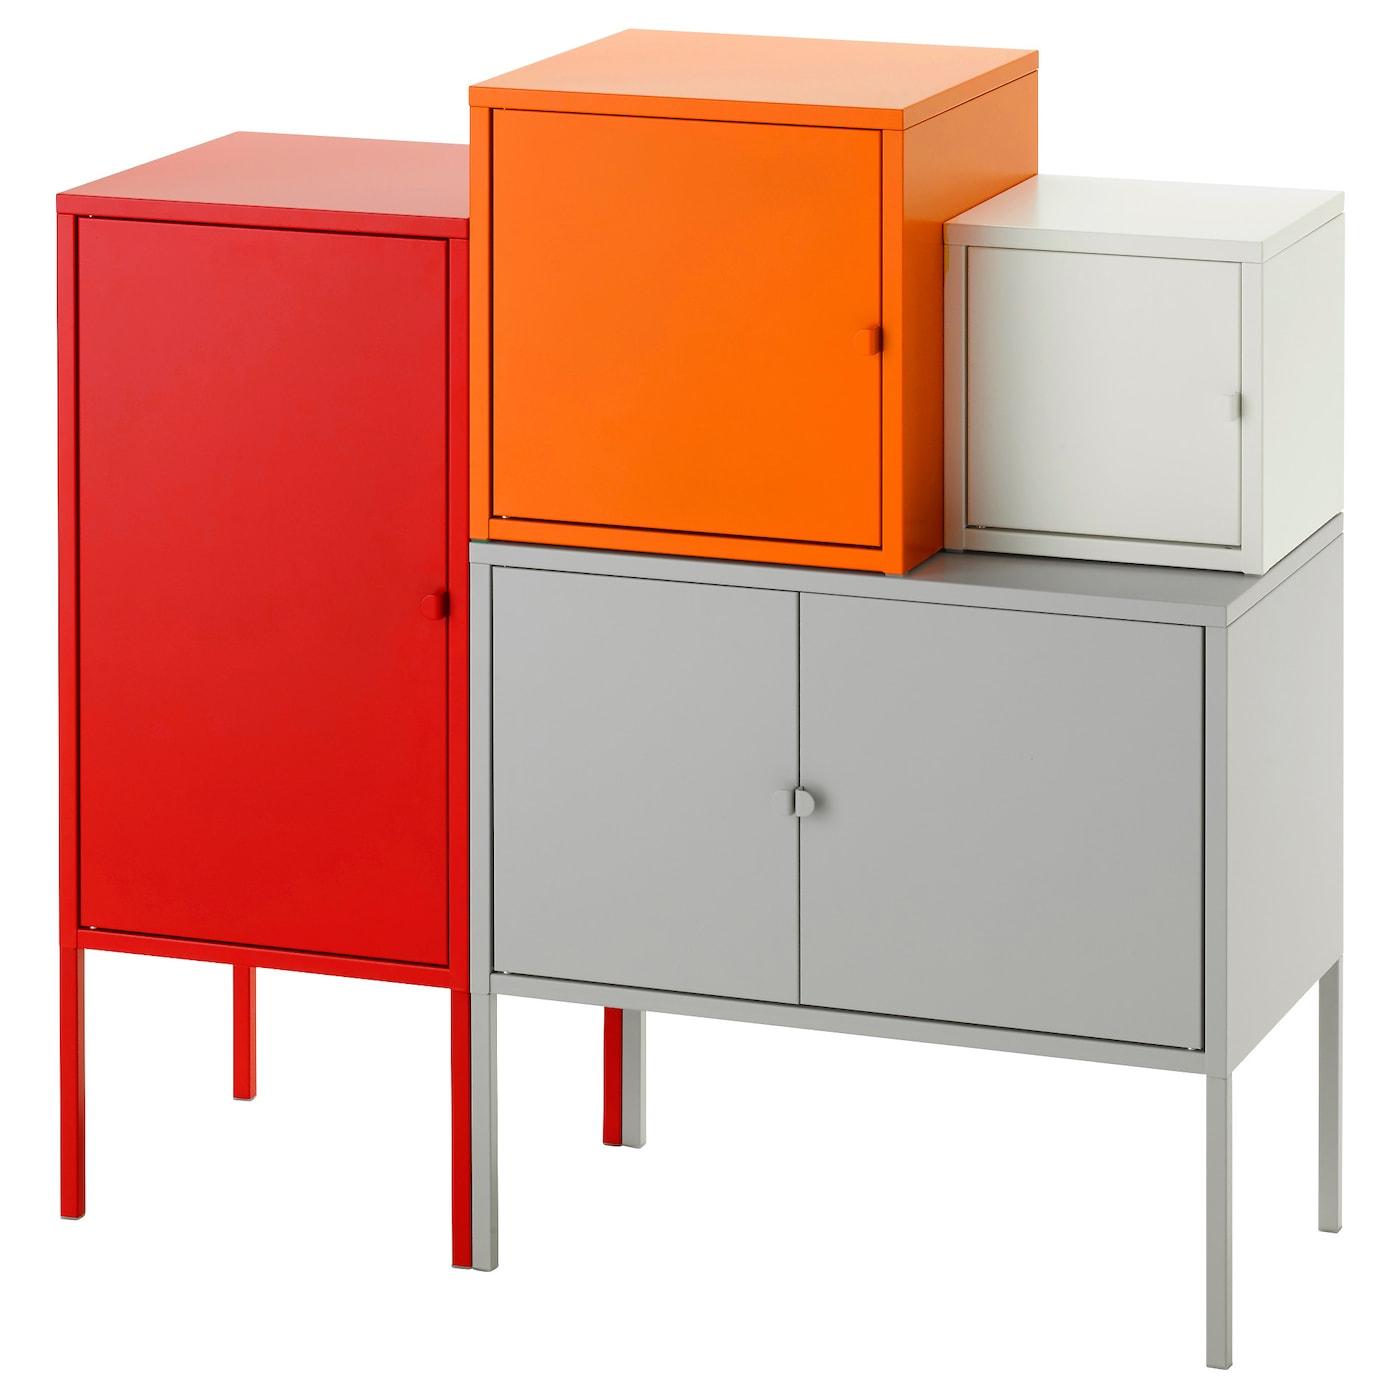 LIXHULT Storage Combination Grey White Orange Red 95x92 Cm IKEA